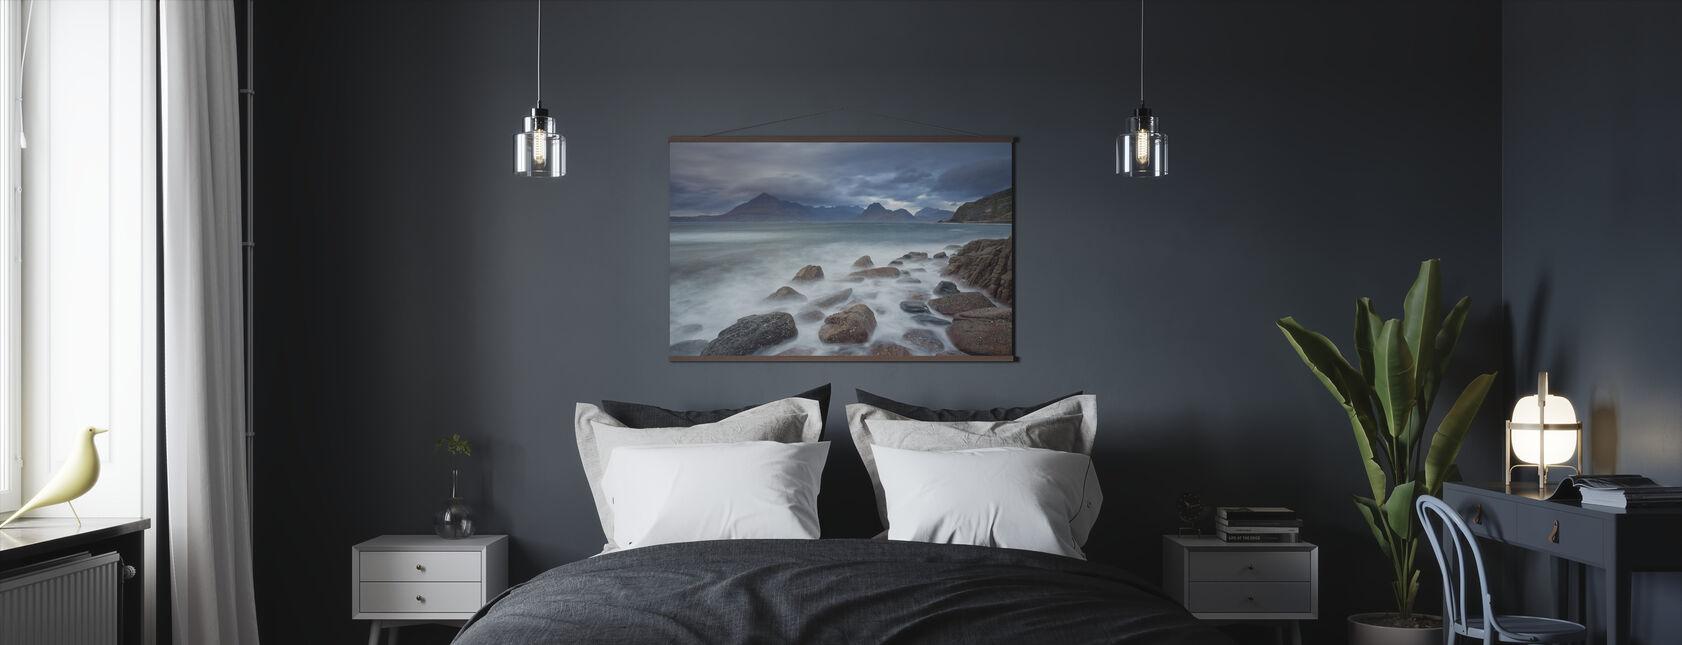 Isle of Skye - Poster - Bedroom